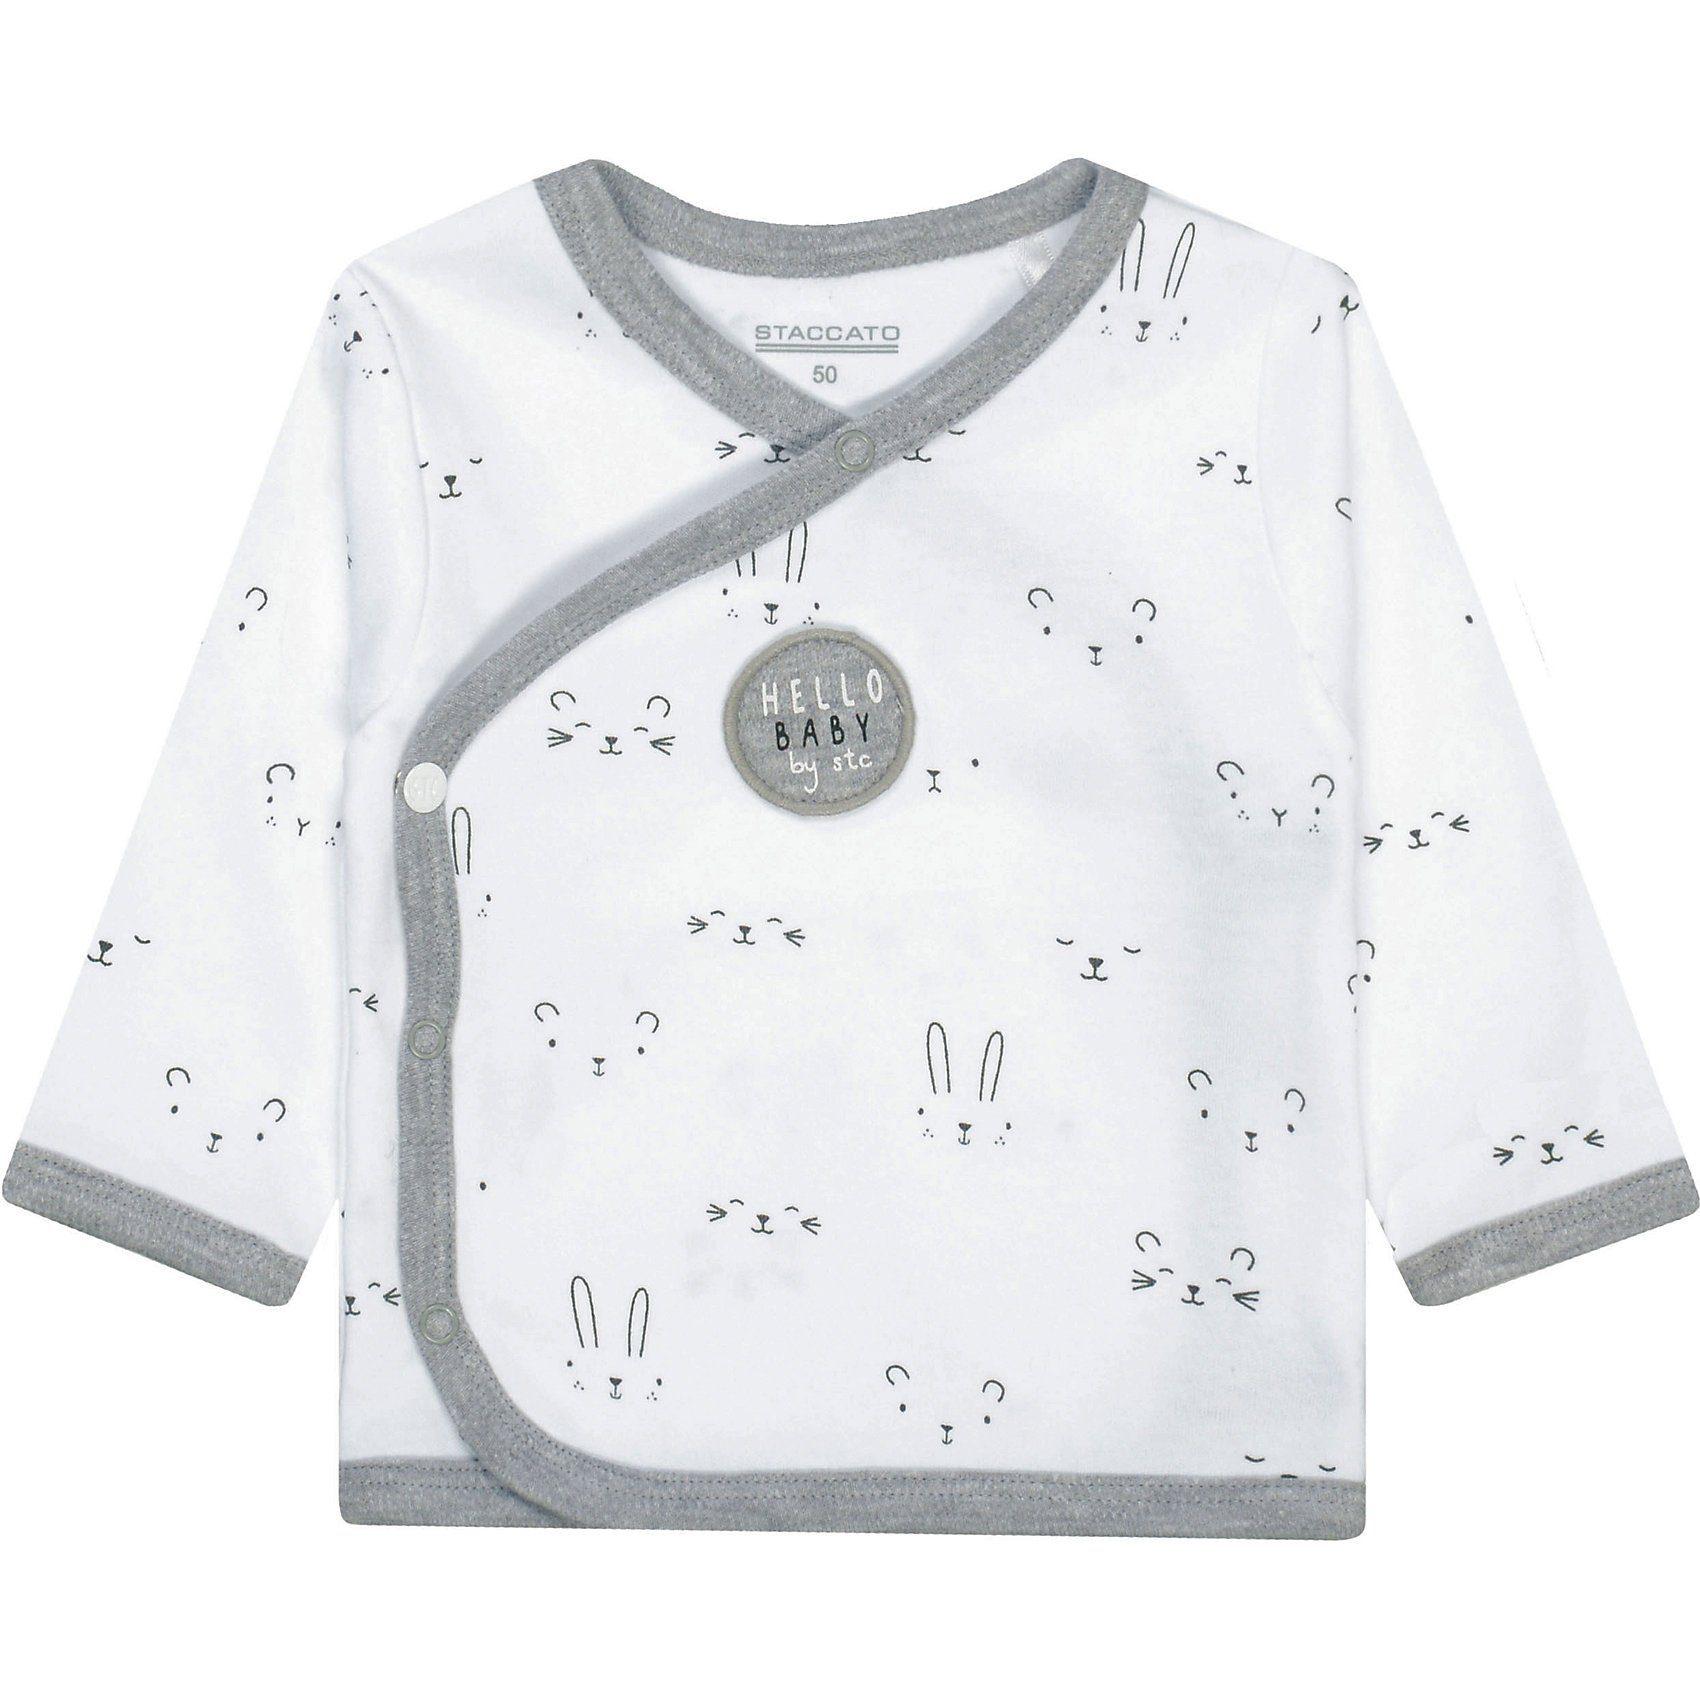 JUVENTUS body Neugeborenen//bambino aus Baumwolle Sweatshirt Weiß Kurzarm Hemd